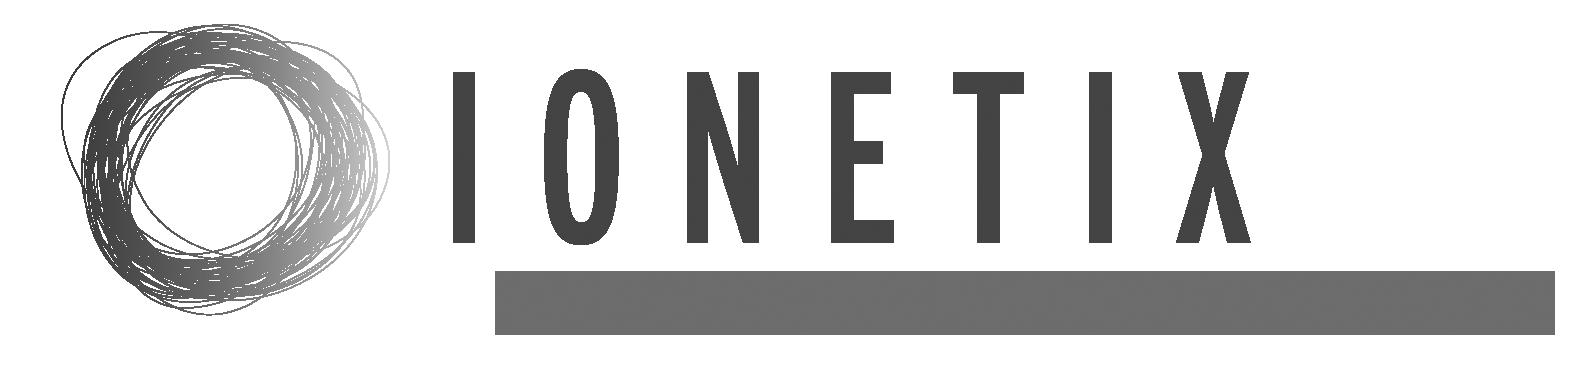 Ionetix-Logo-Tag-Line-2018 copy.png